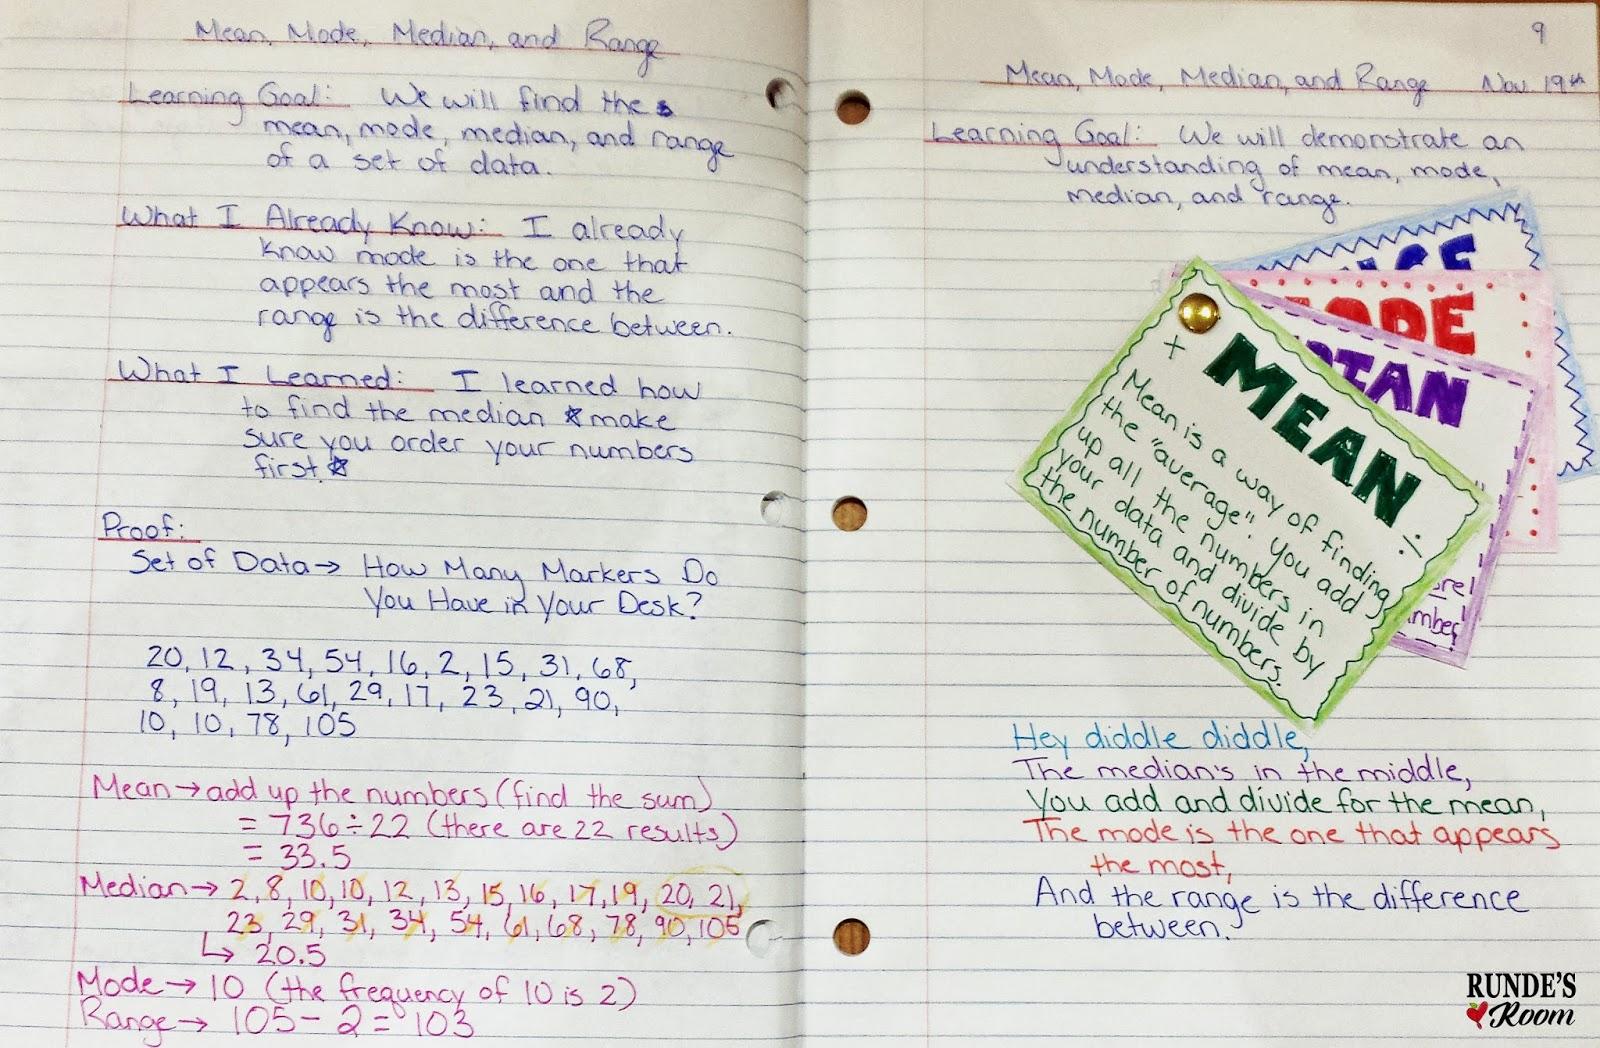 5 Activities to Teach Mean, Mode, Median | RUNDE'S ROOM